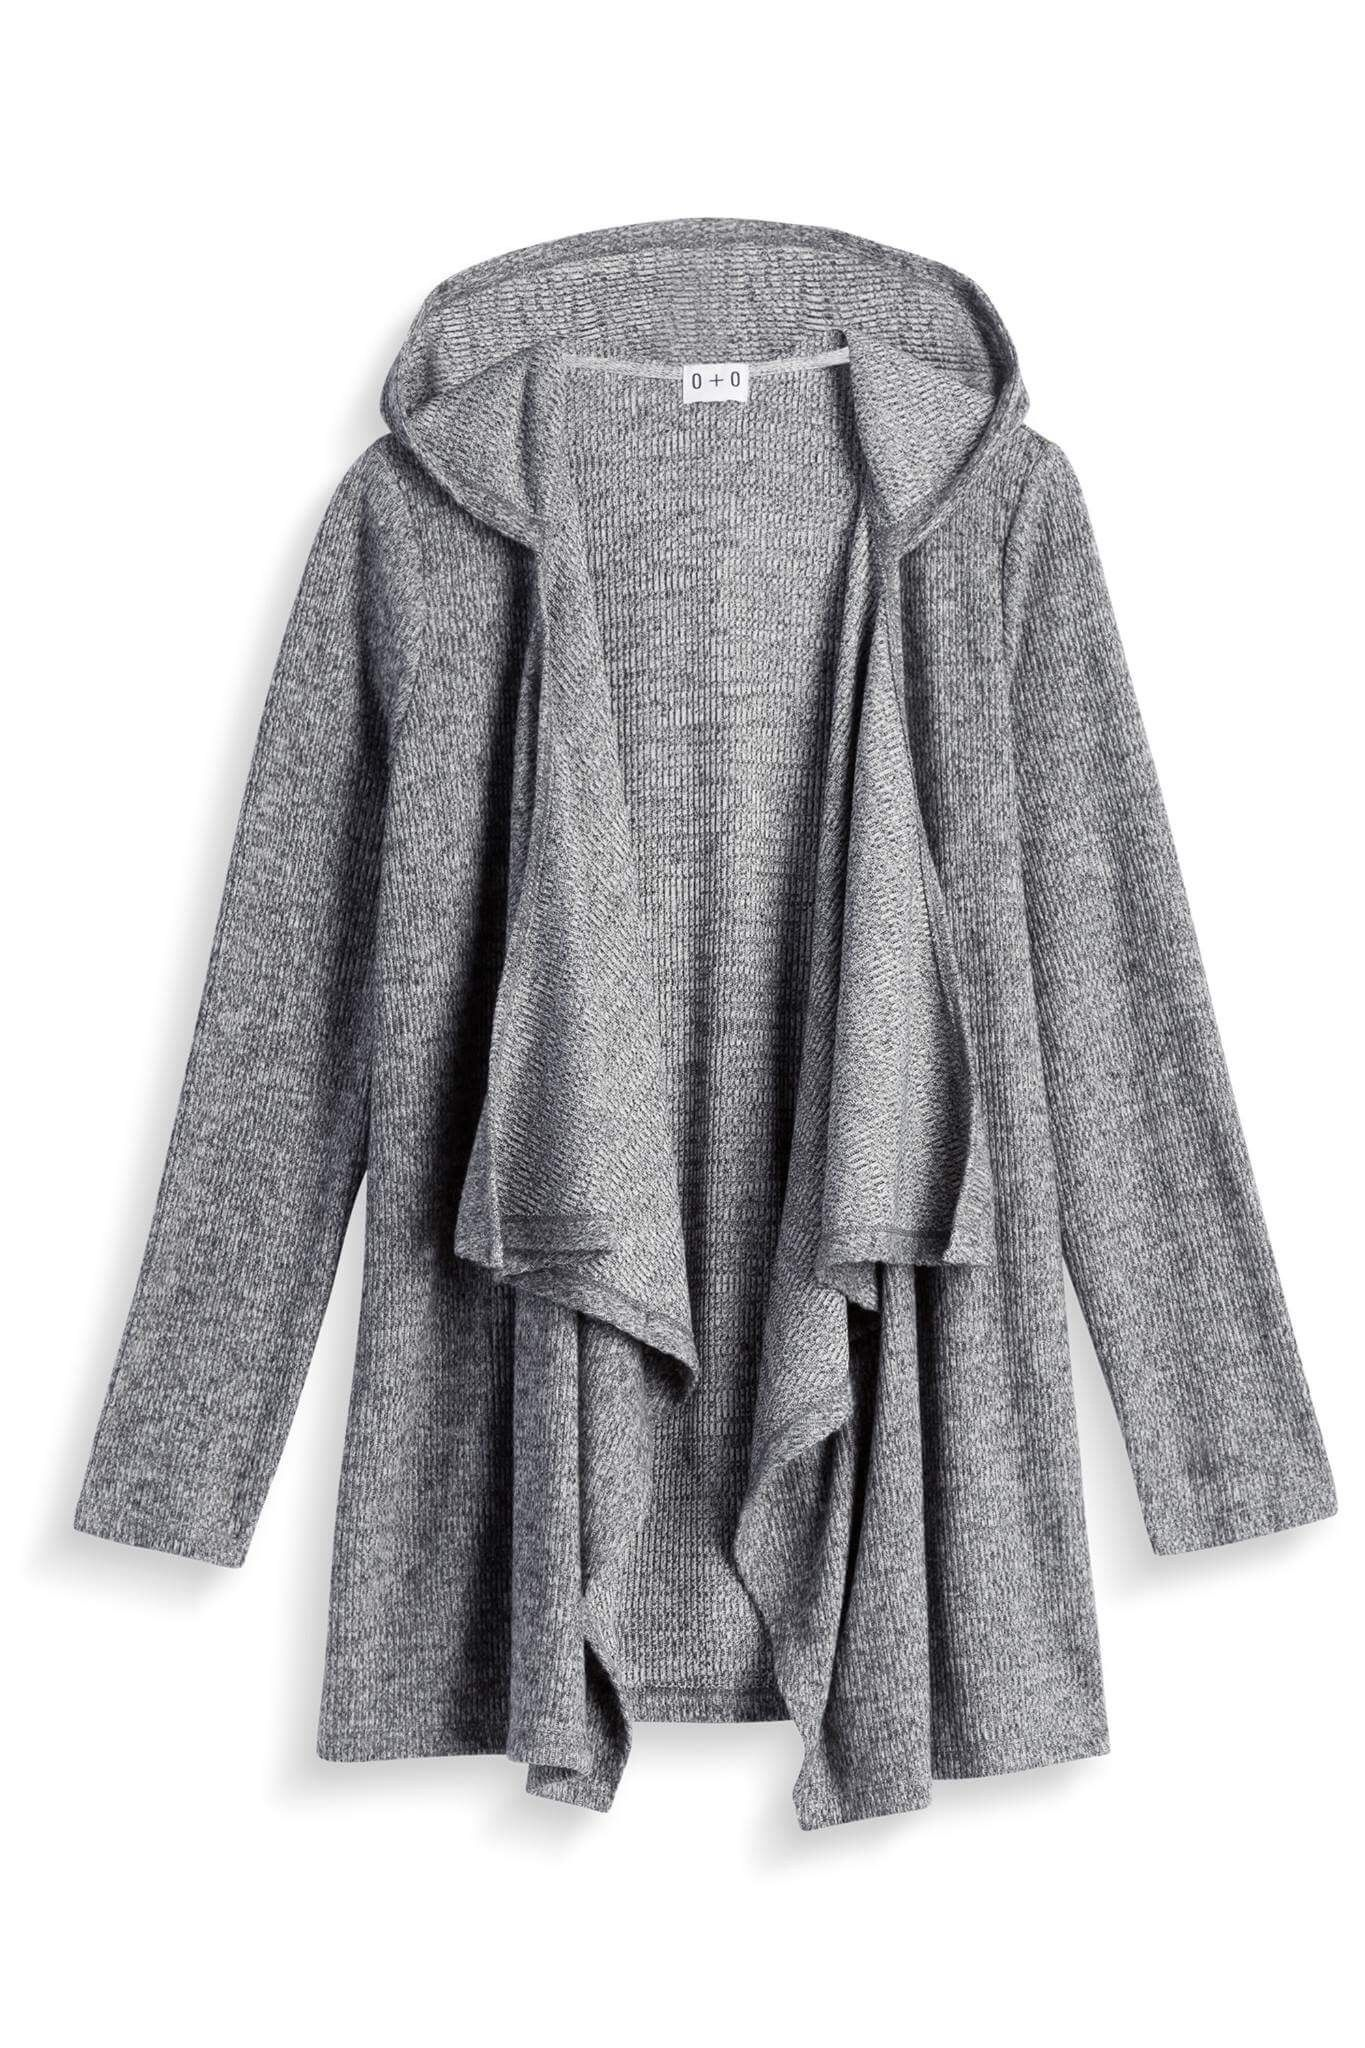 Olive & Oak Miah Hooded Cardigan, grey heather drape | FB Stitch ...